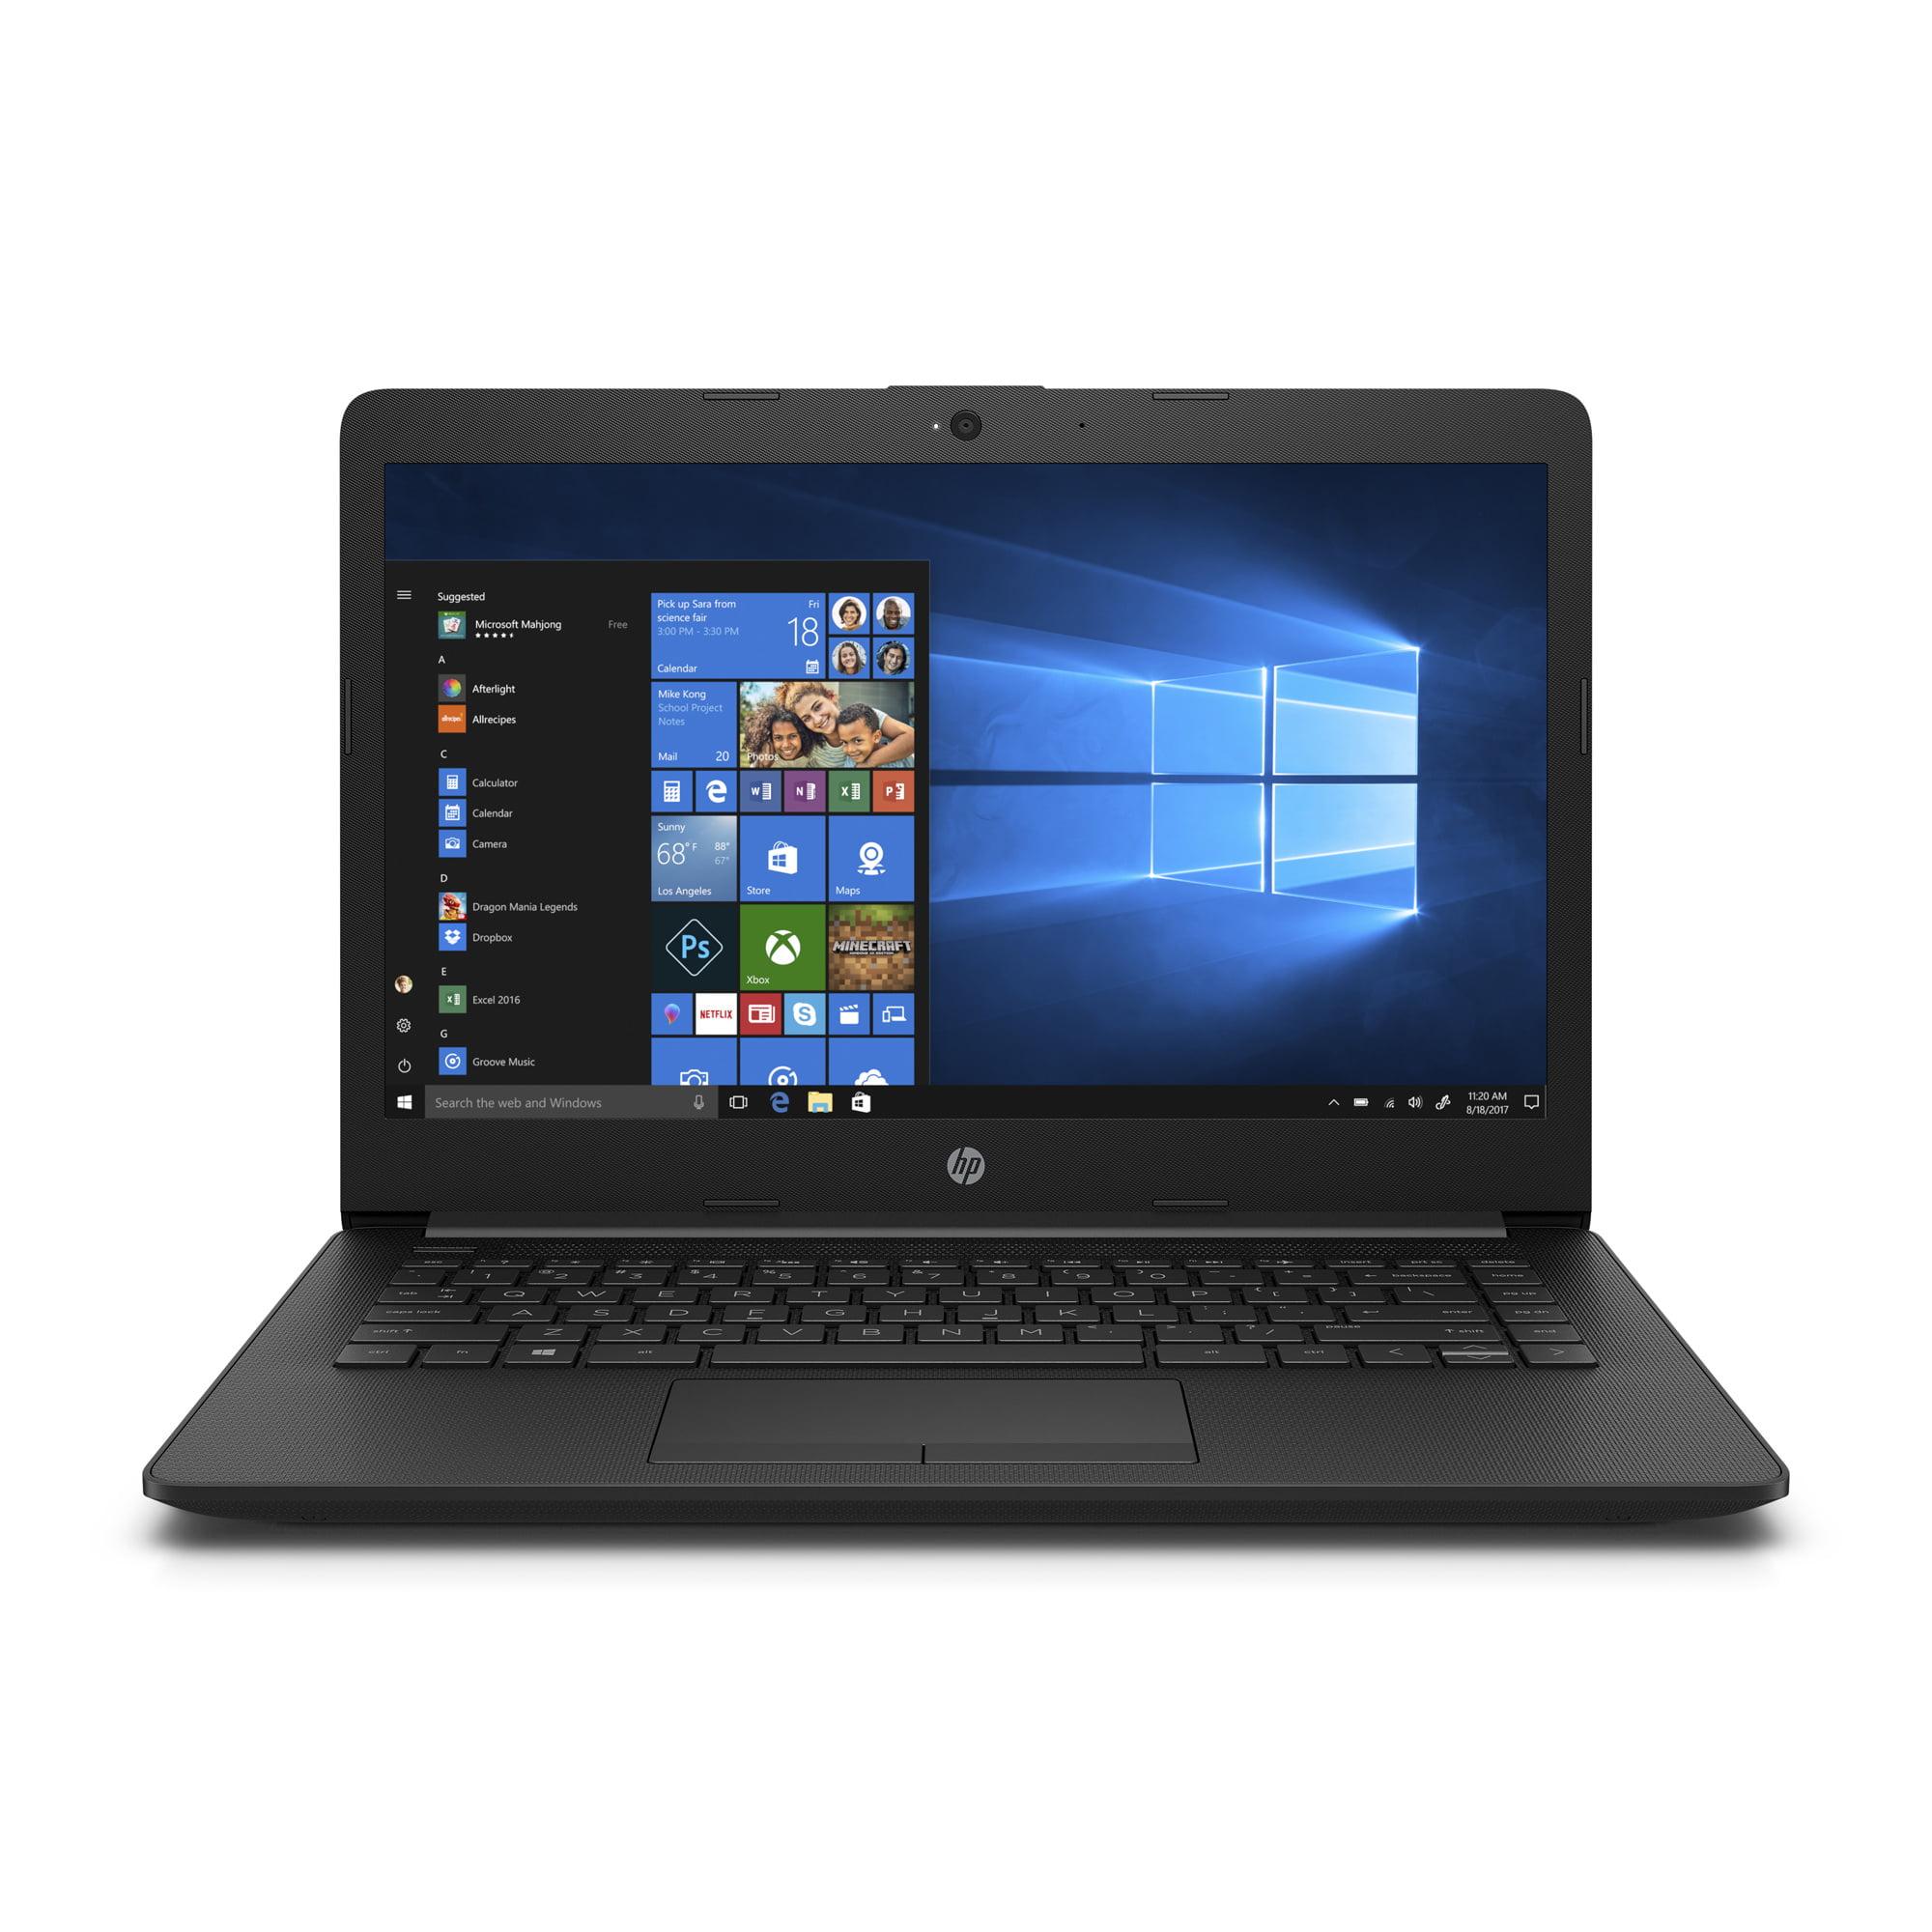 HP 14-CM0010NR Jet Black 14 inch Laptop, Windows 10, E2-9000e QC Processor, 4GB Memory, 500 GB Hard Drive, UMA Graphics, HD Audio